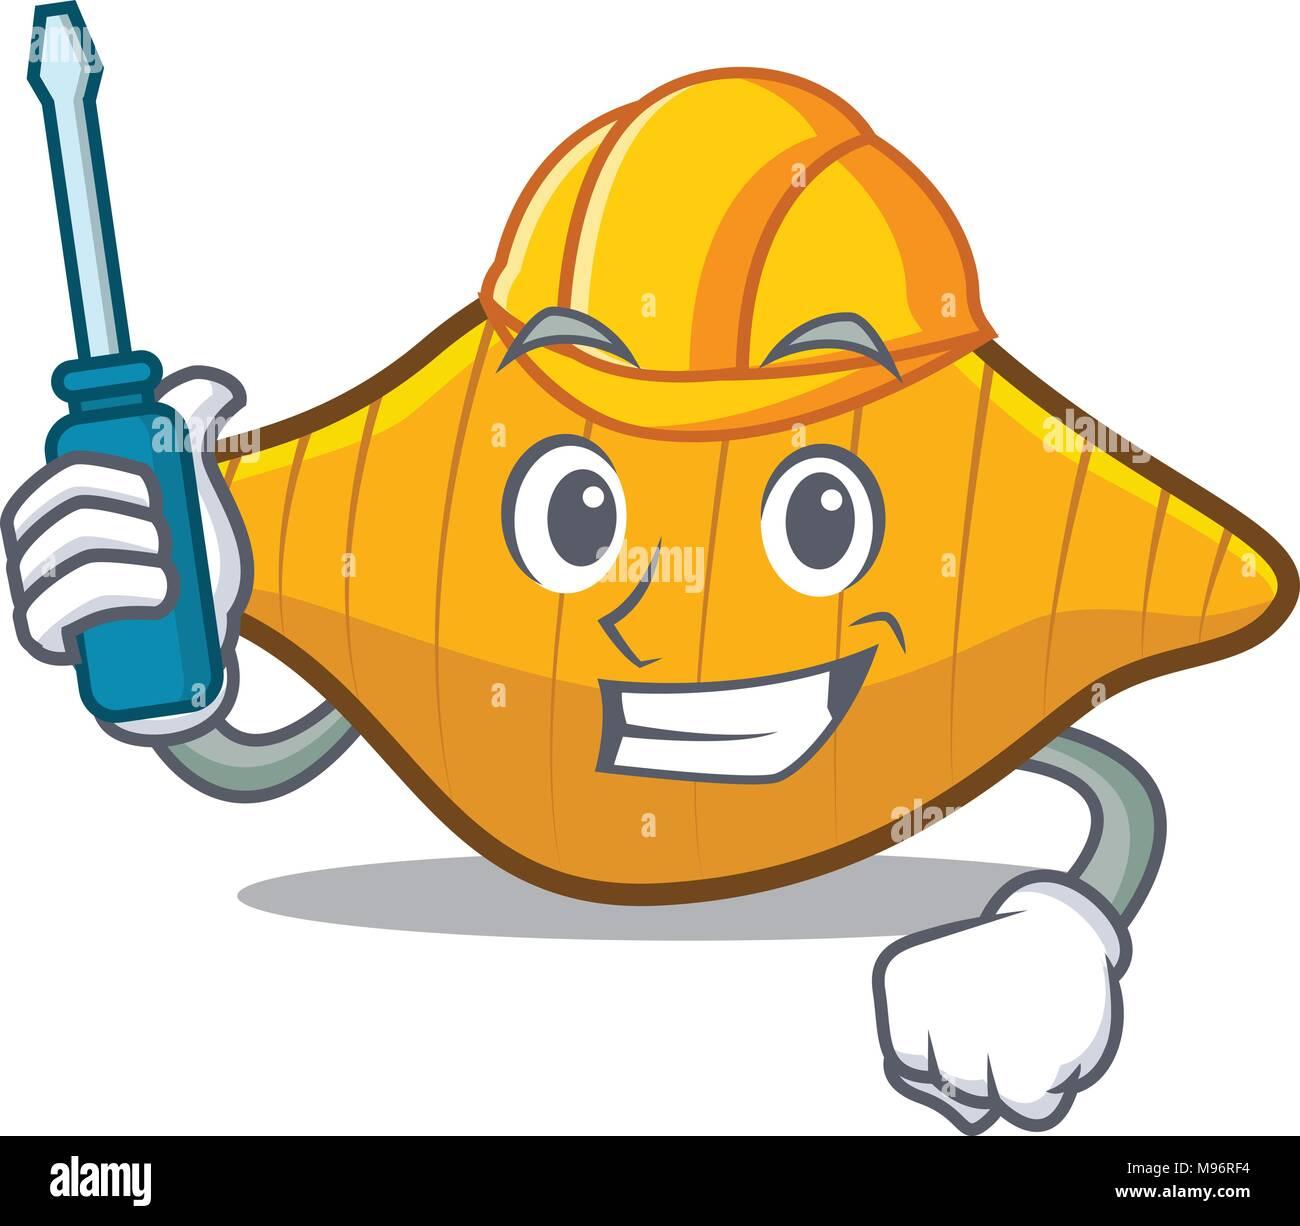 Automotive conchiglie pasta mascot cartoon Stock Vector